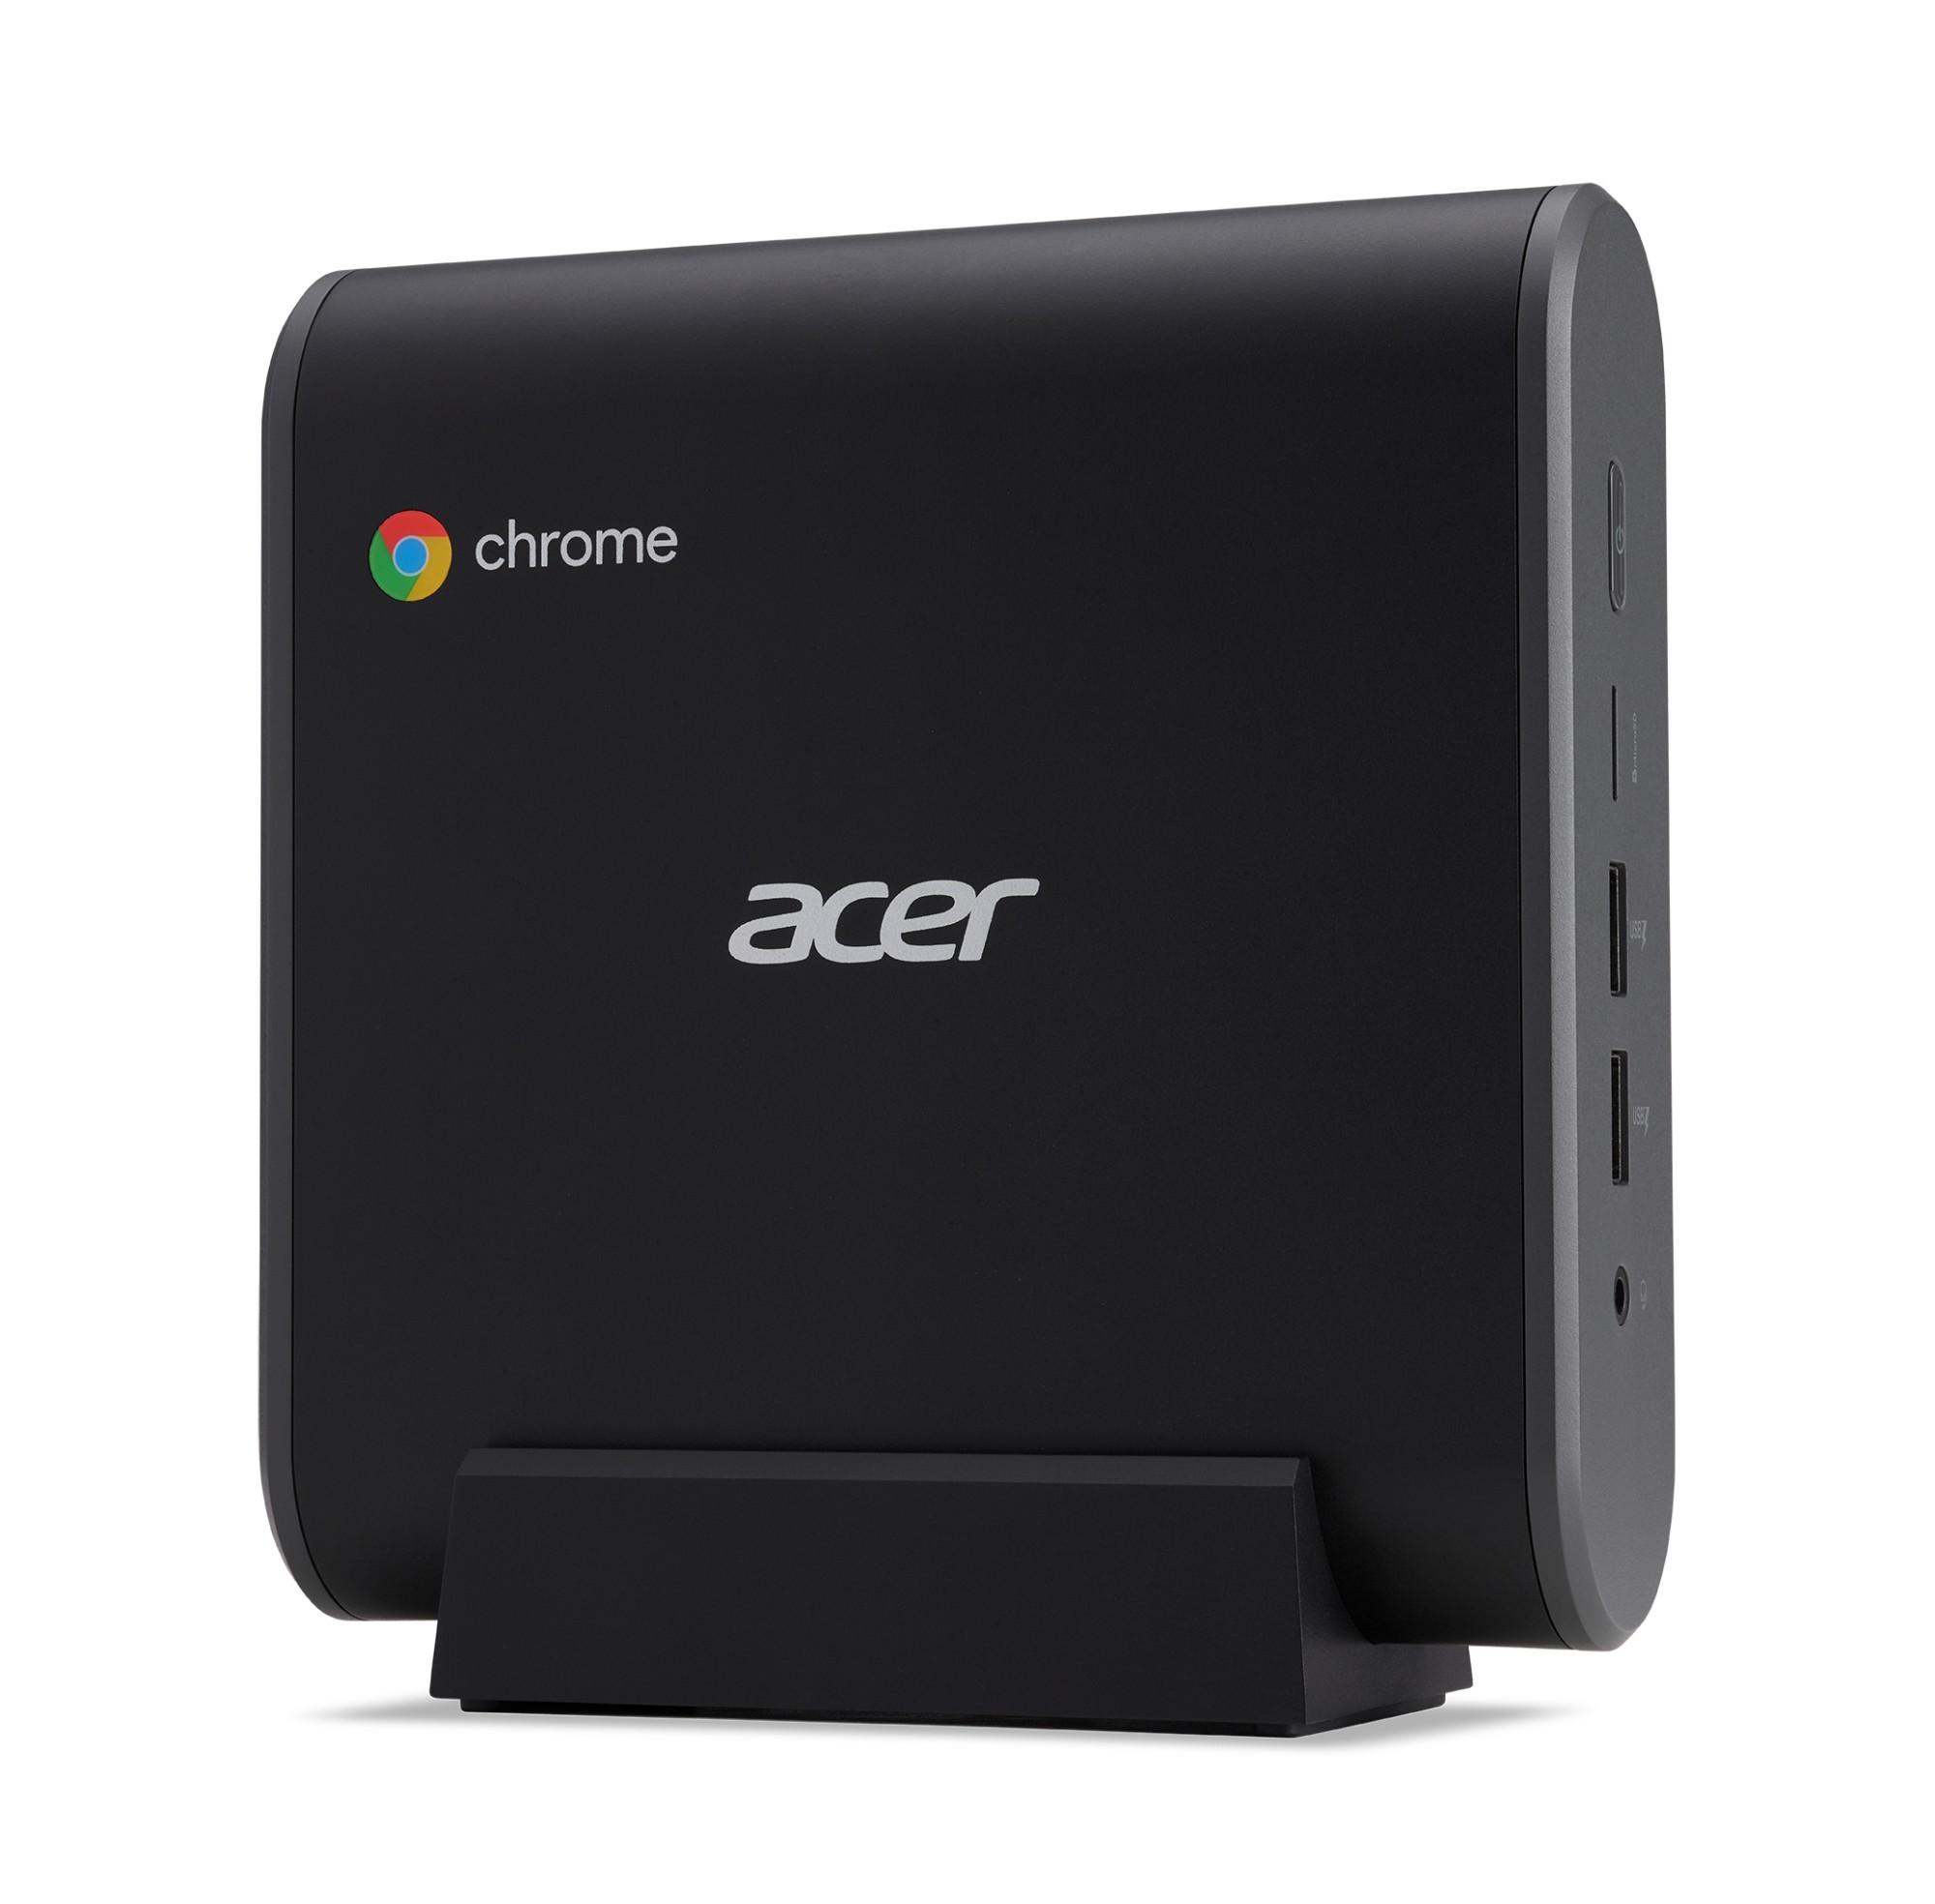 Acer Chromebox CXI3 Intel® Celeron® 3867U 4 GB DDR4-SDRAM 32 GB SSD mini PC Negro Chrome OS